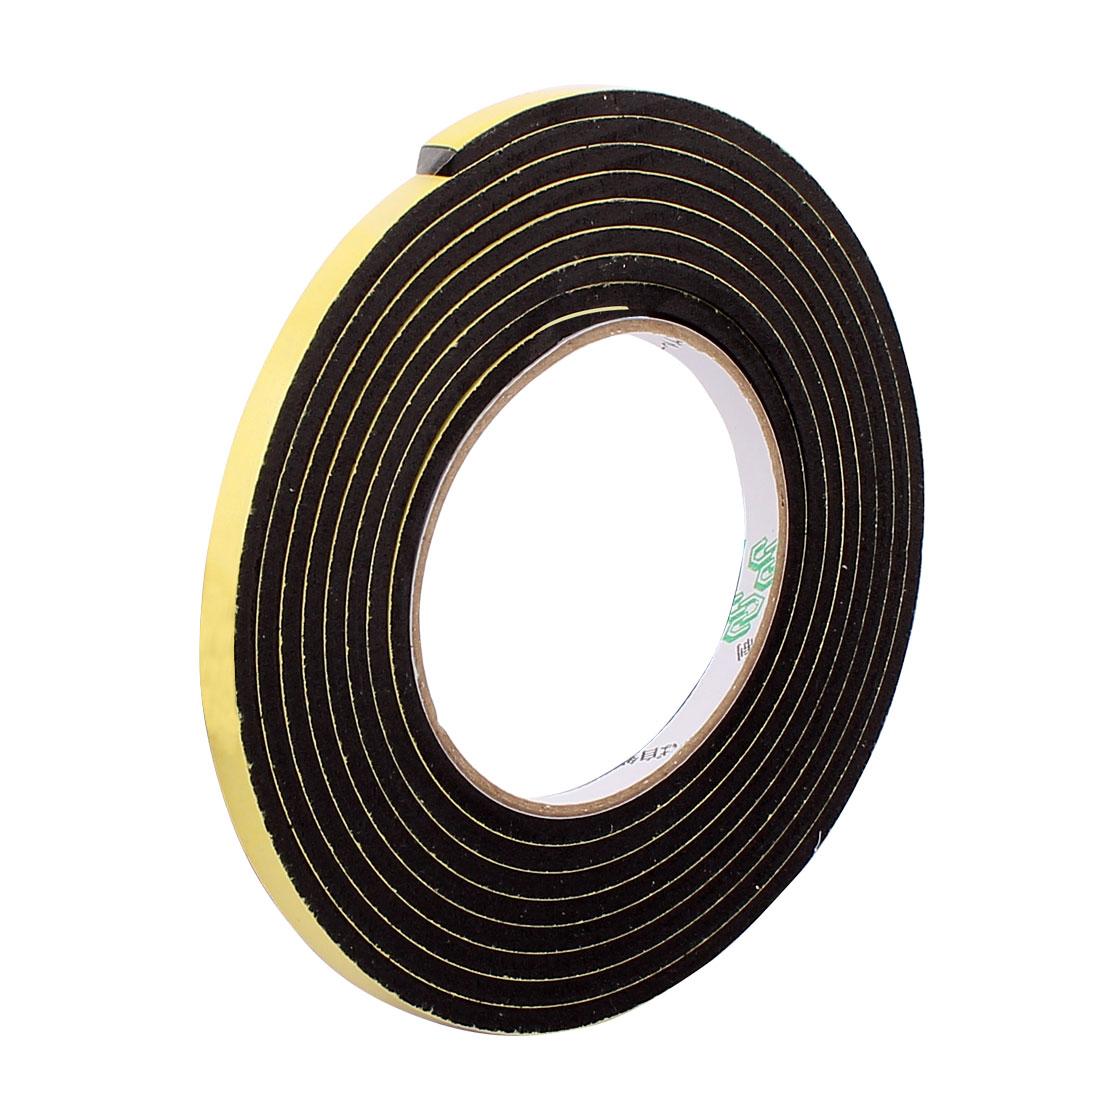 Black 0.6CM Wide 4M Length 3MM Thick Single Sided Shockproof Sponge Tape